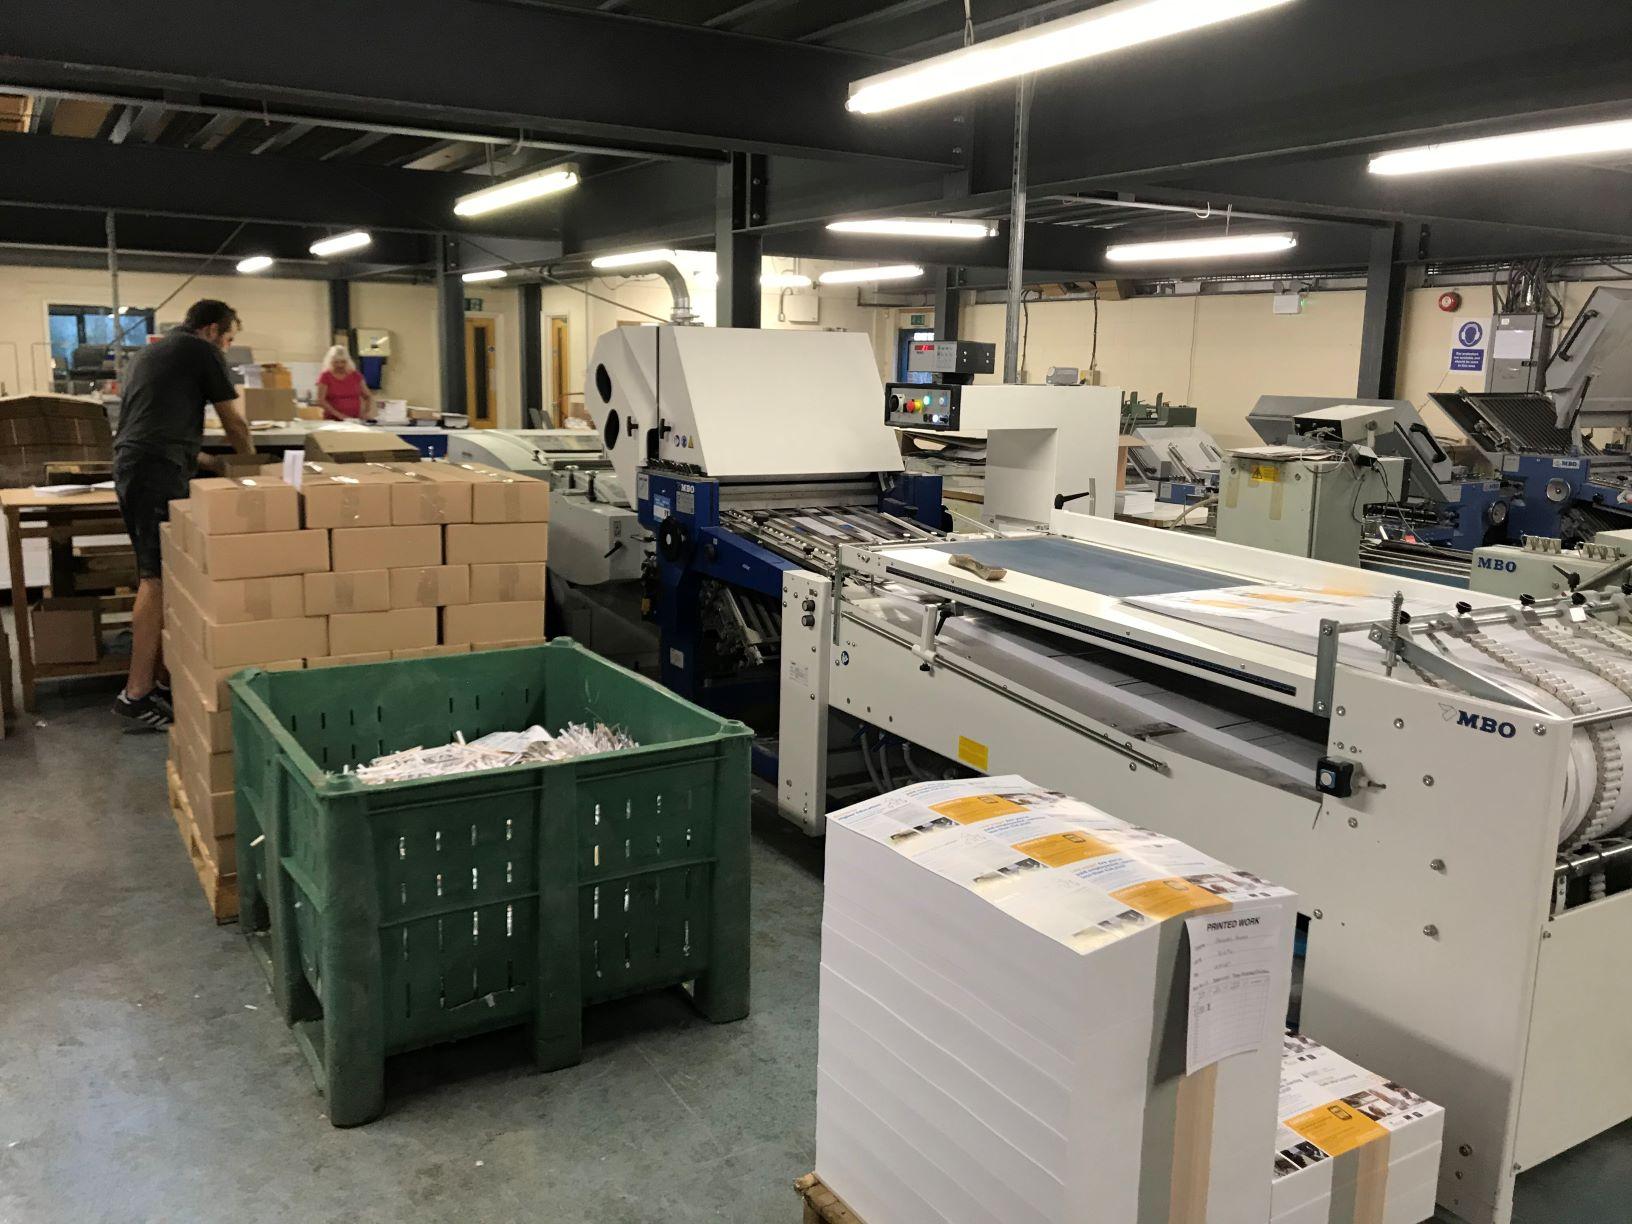 automatic delivery, b1 folder, b2 folder, b1 folding, b2 folding, palamides, MBO, deltor